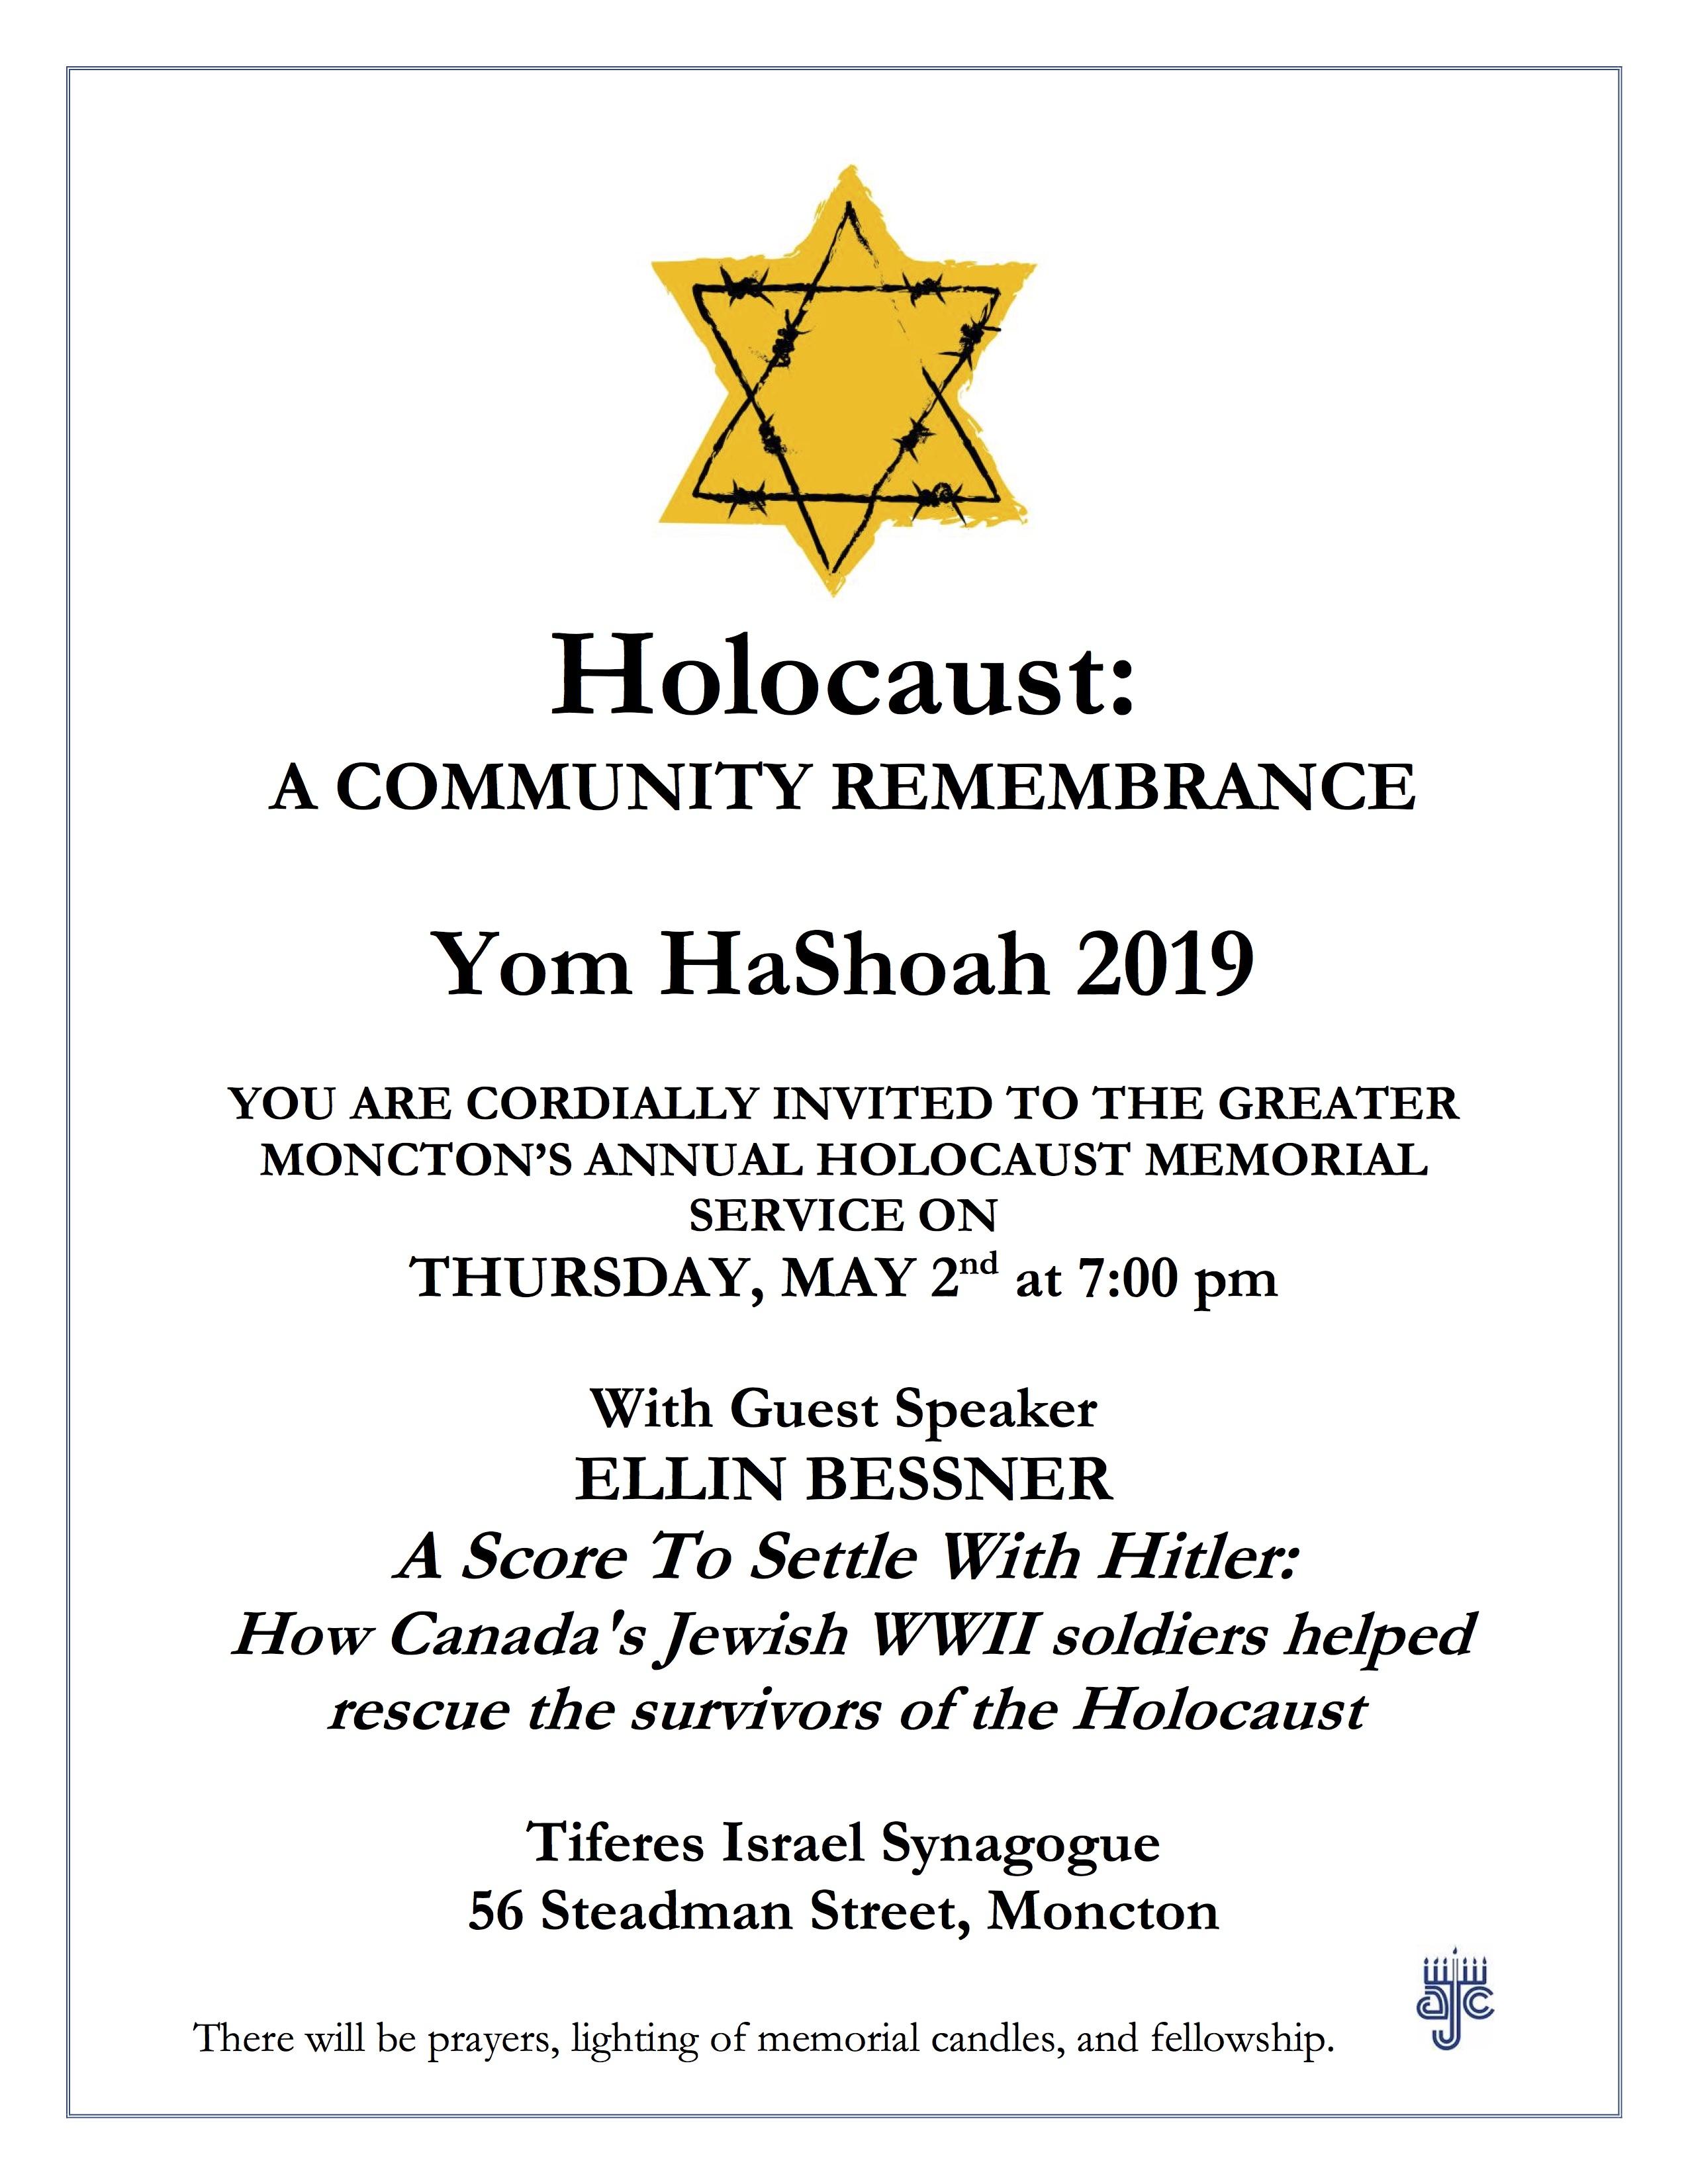 News & Events (Tiferes Israel Synagogue)